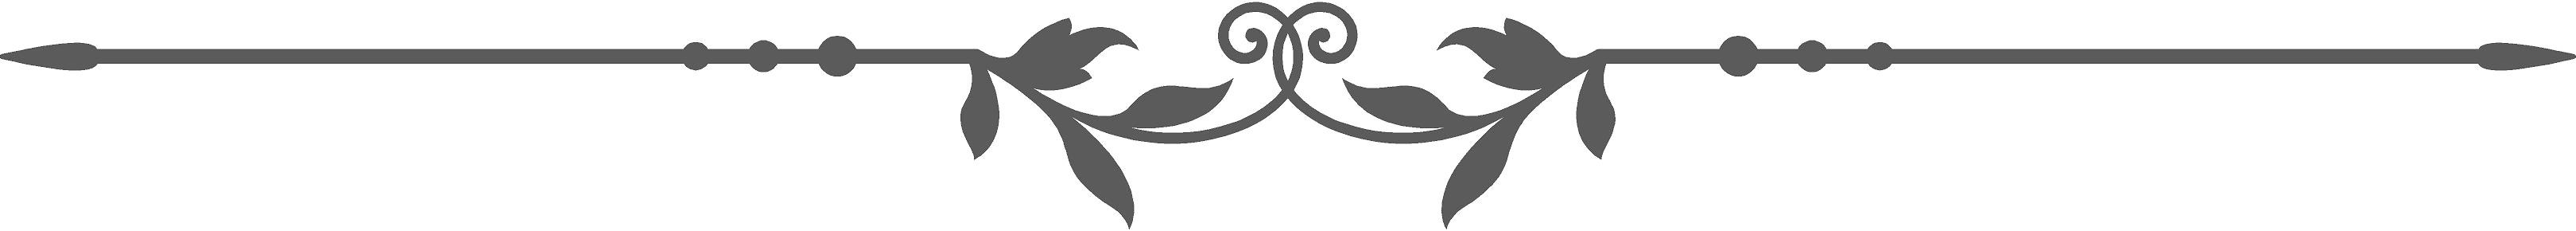 Decorative underline clipart jpg freeuse download Decorative underline clipart 2 » Clipart Station jpg freeuse download